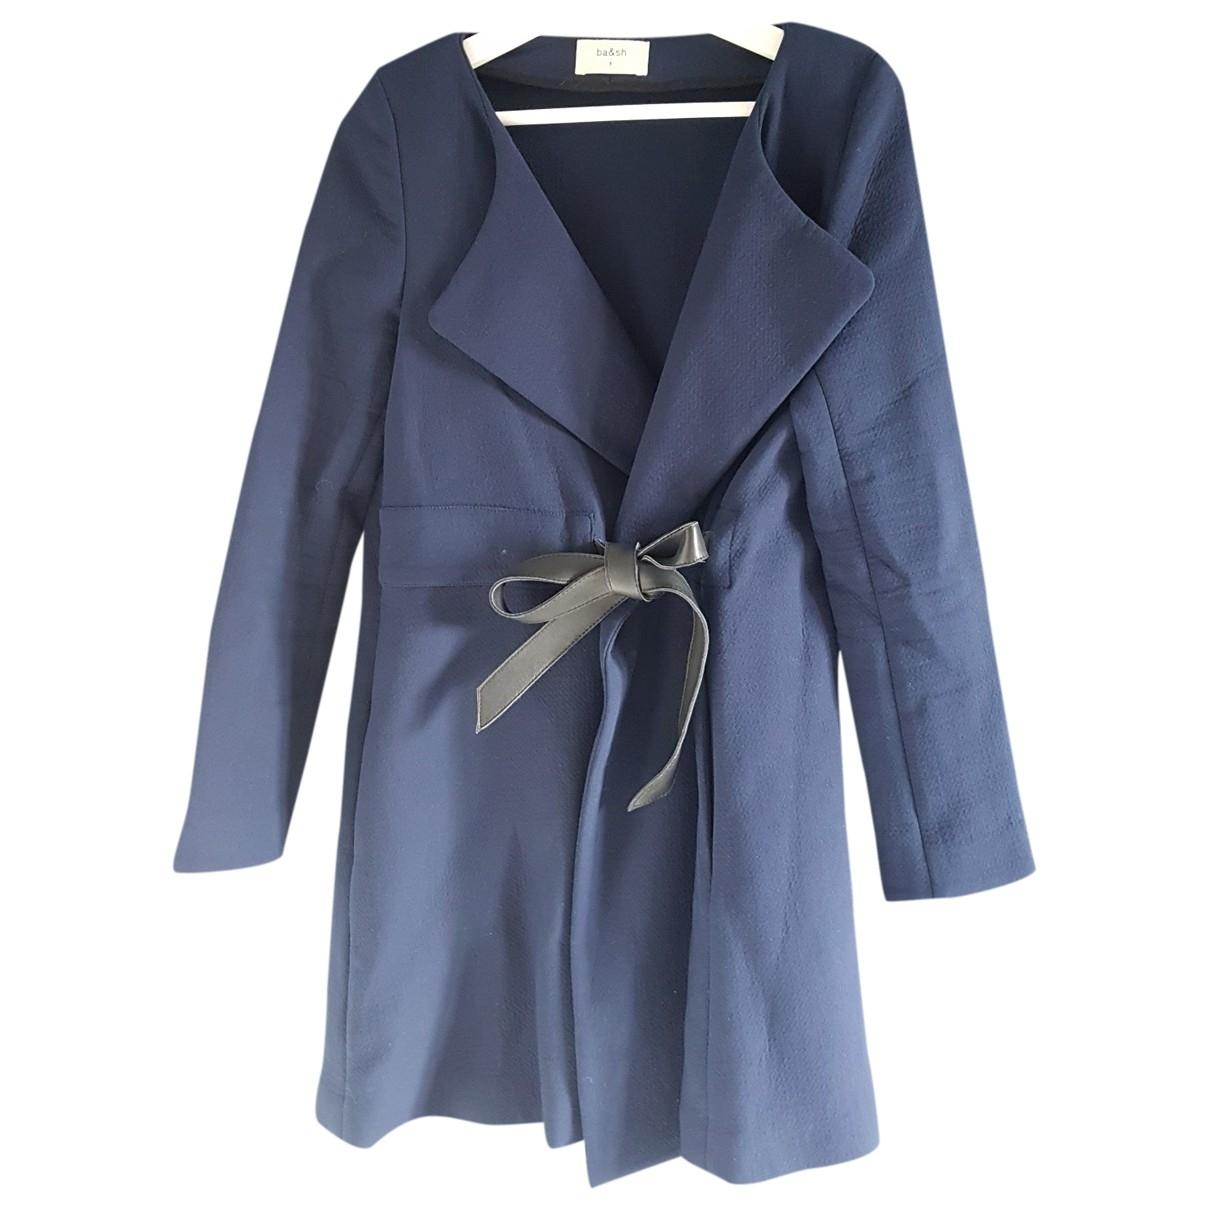 Ba&sh \N Navy Cotton coat for Women 36 FR